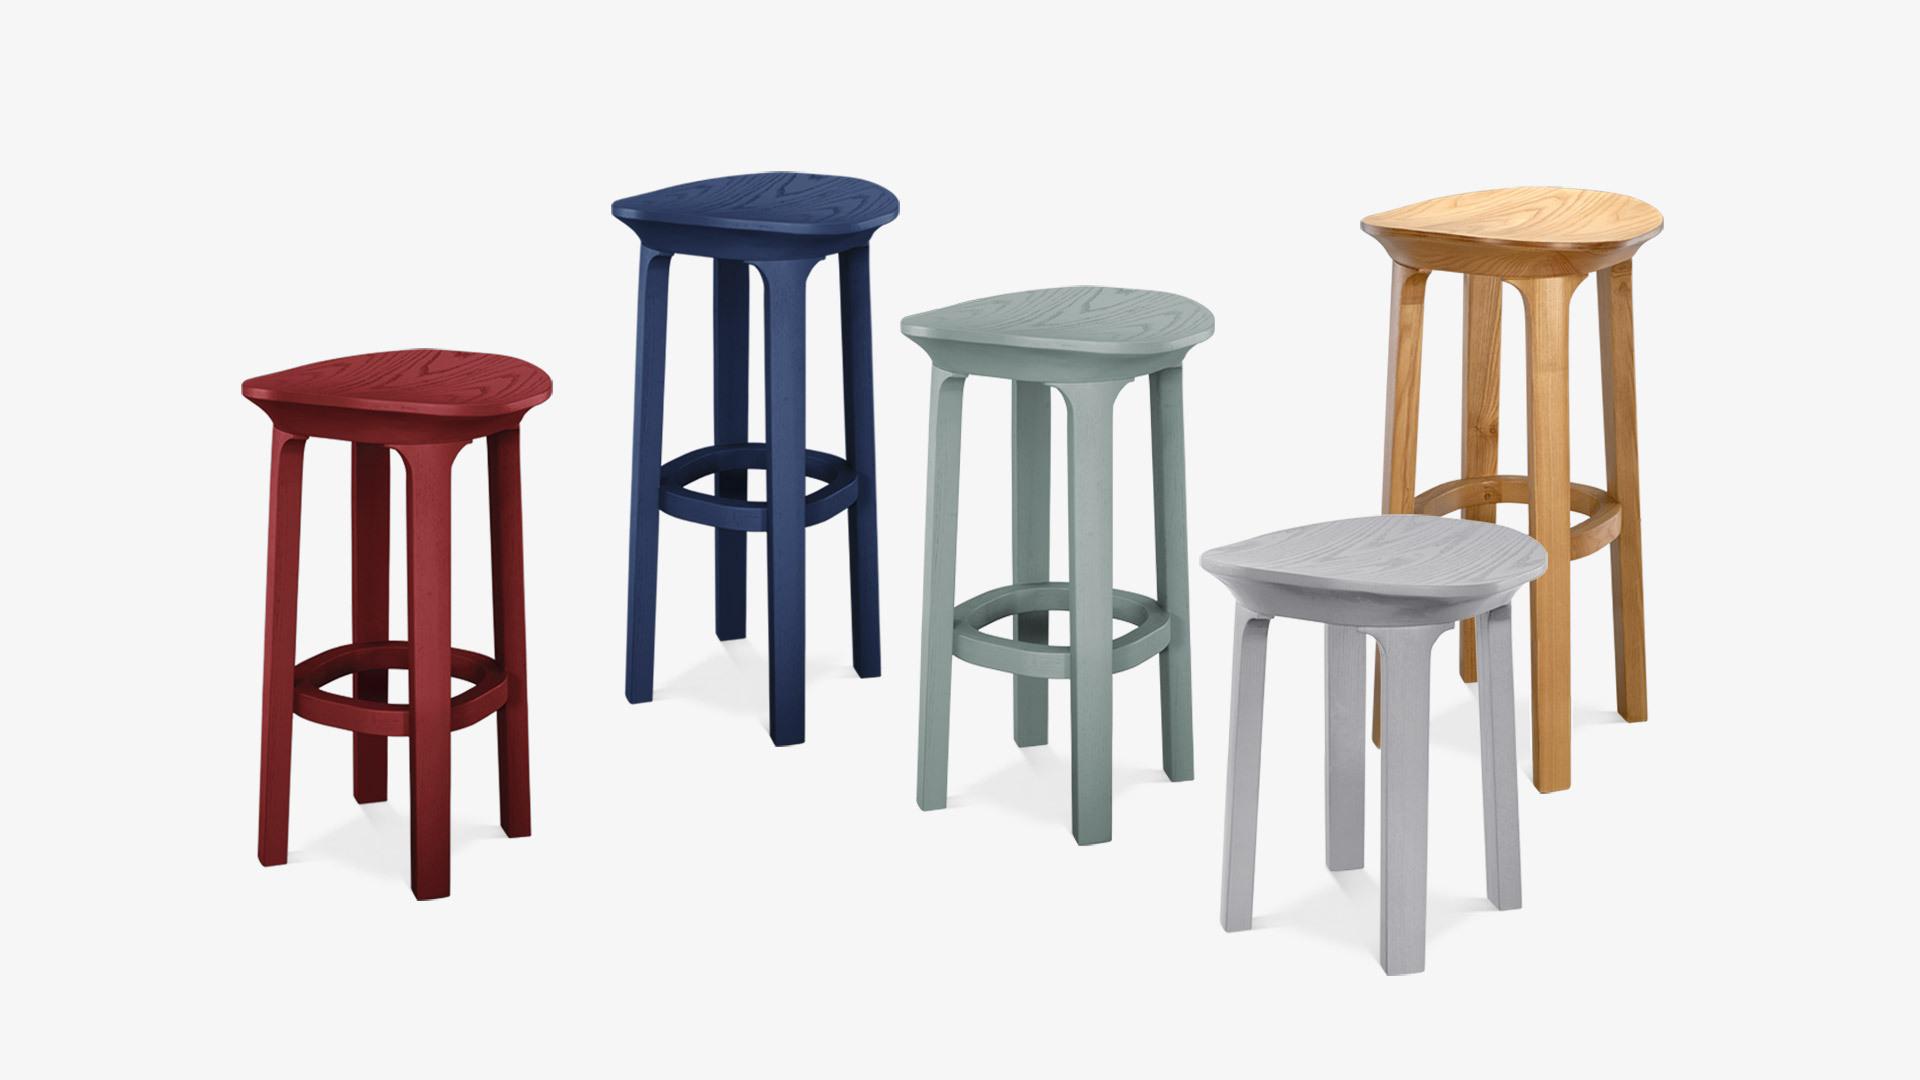 瓦檐小凳 | Tab Series